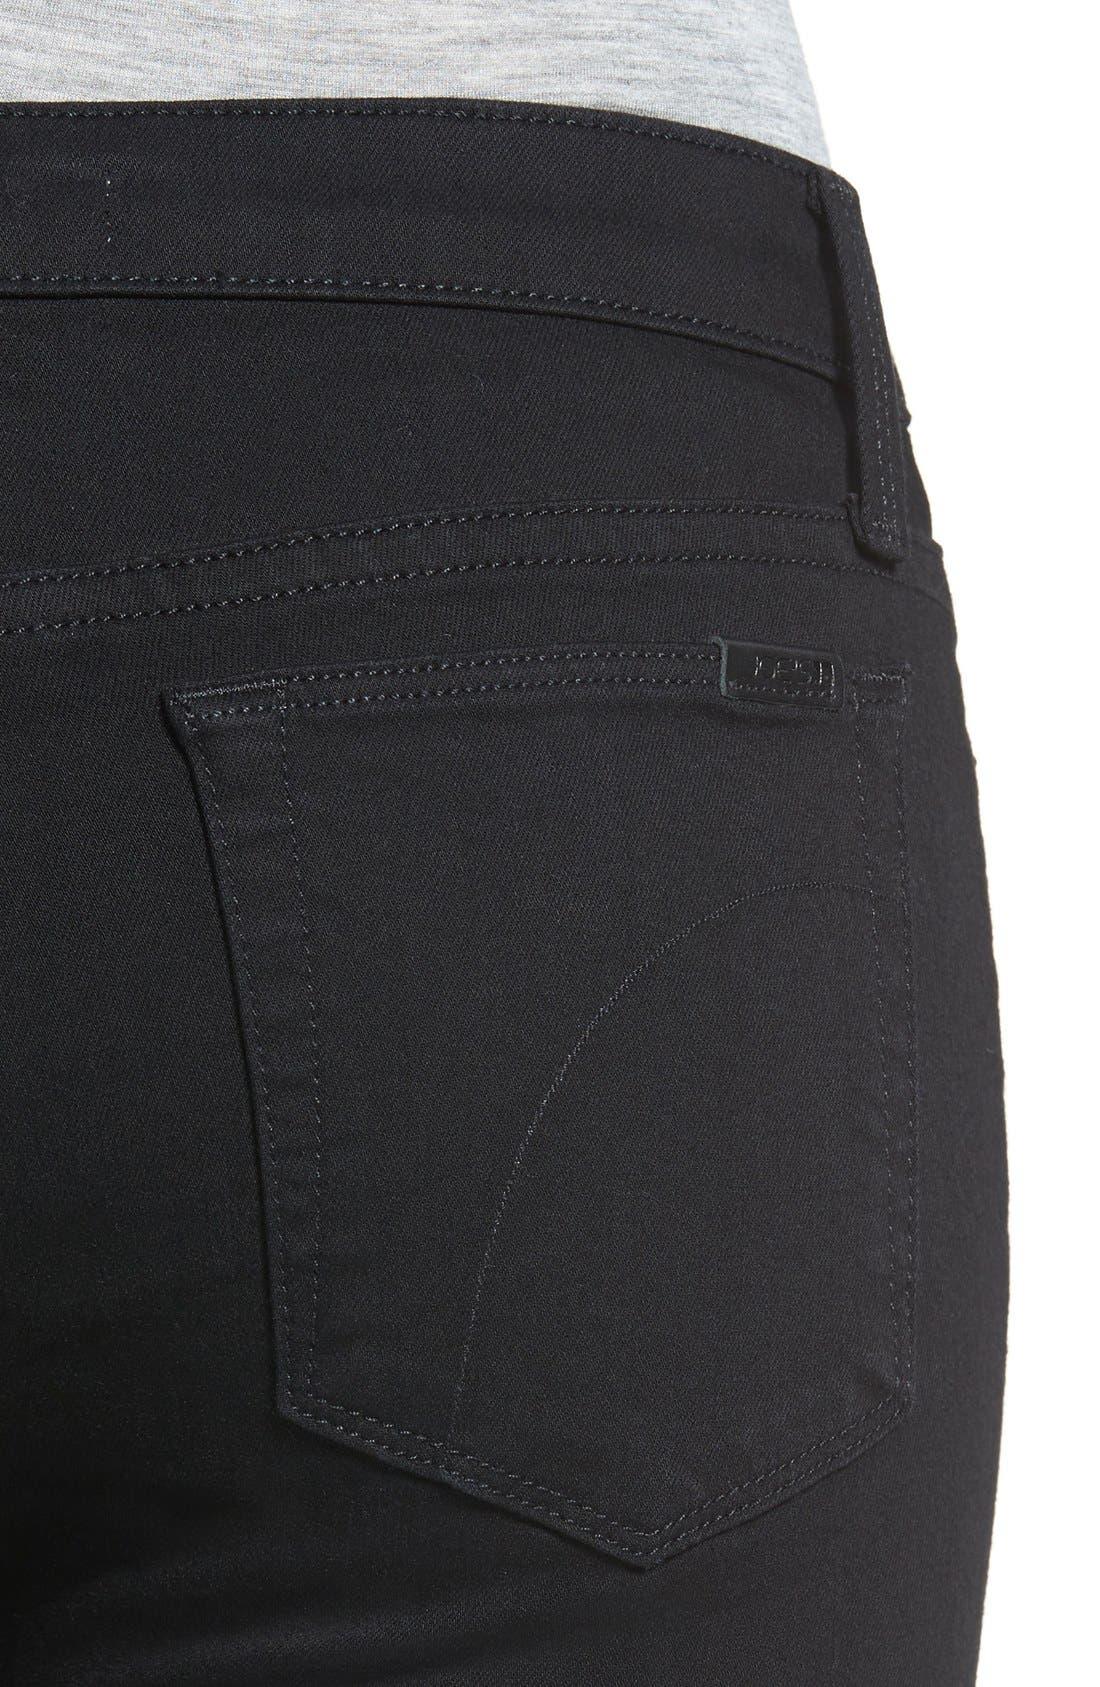 'Flawless - Twiggy' Skinny Jeans,                             Alternate thumbnail 5, color,                             REGAN